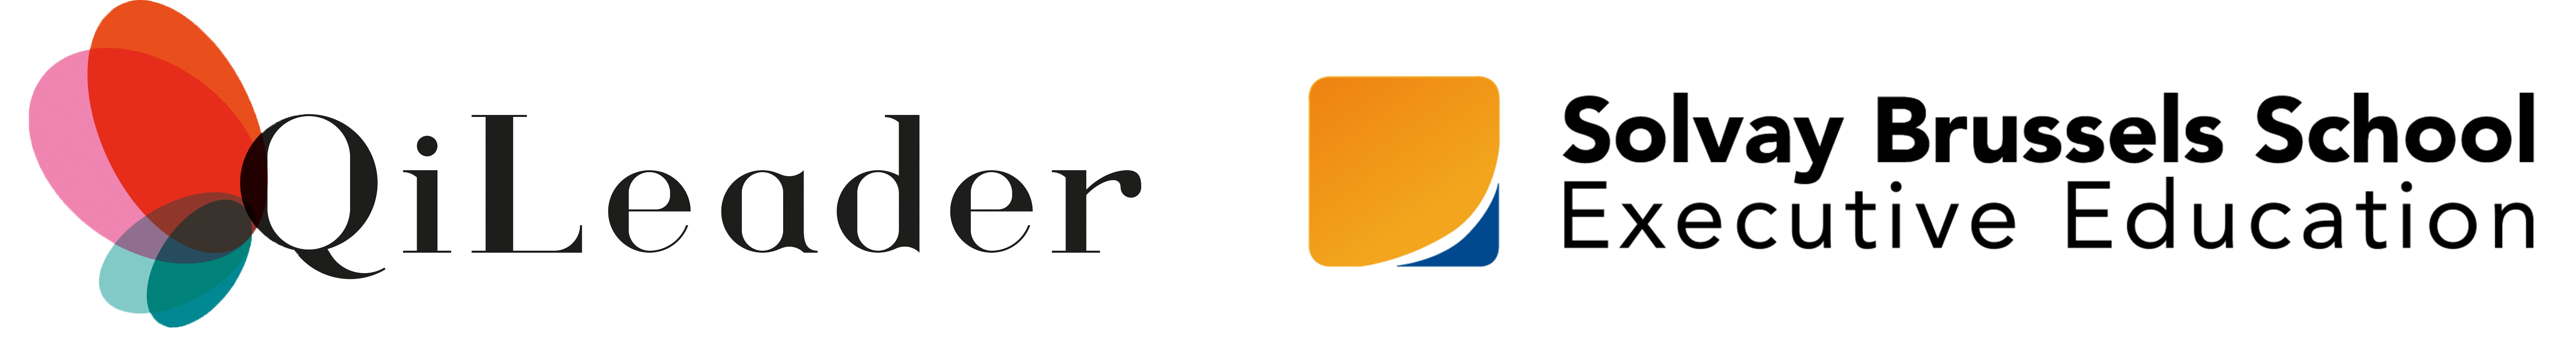 Logo qileader & logo solvay